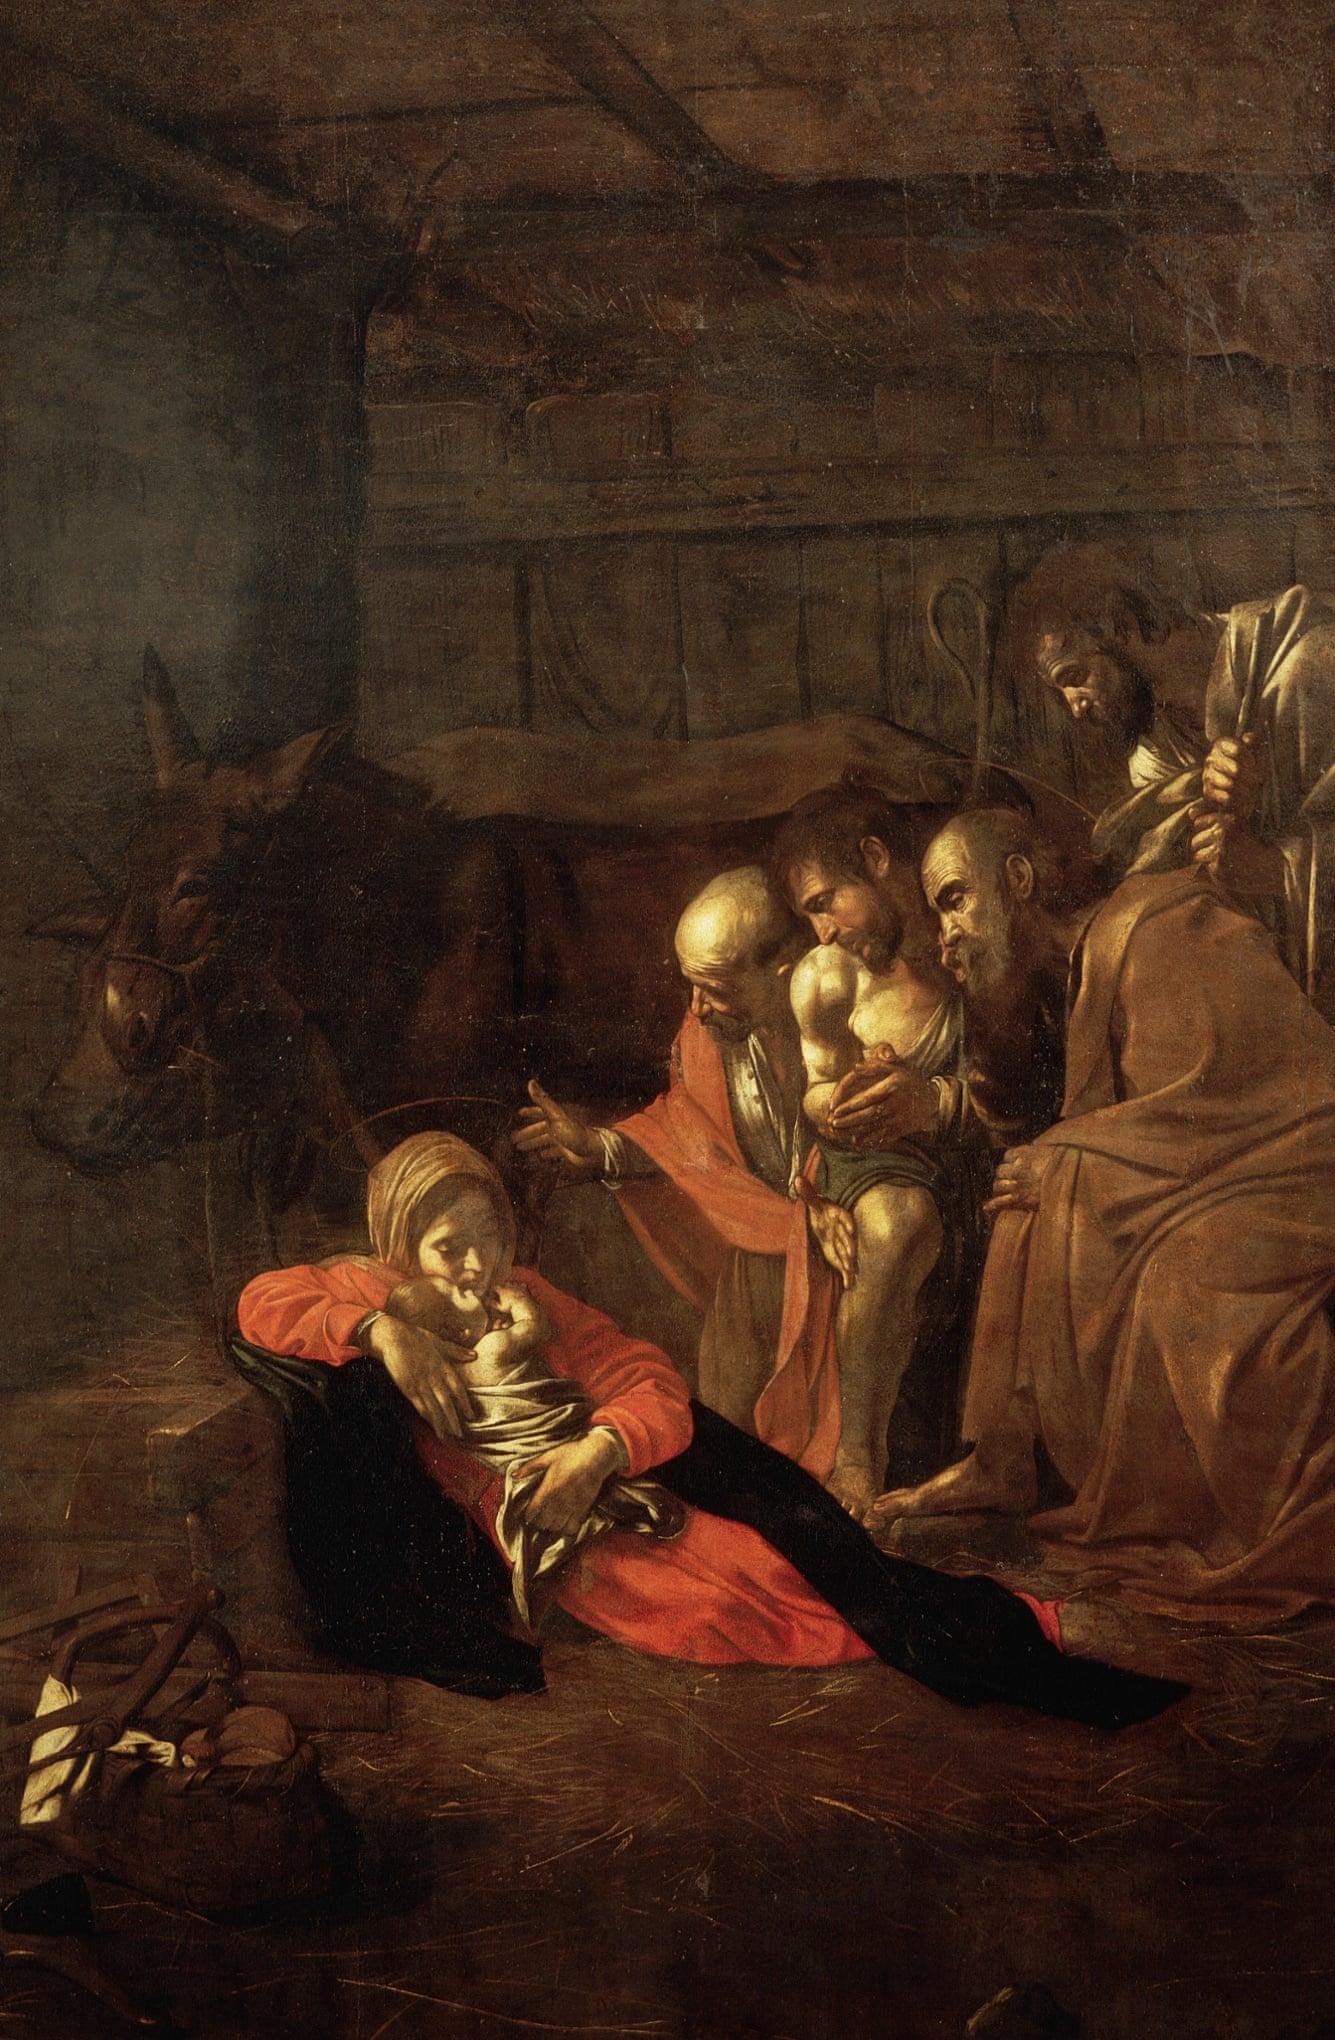 Adorația Păstorilor, Caravaggio (1609)